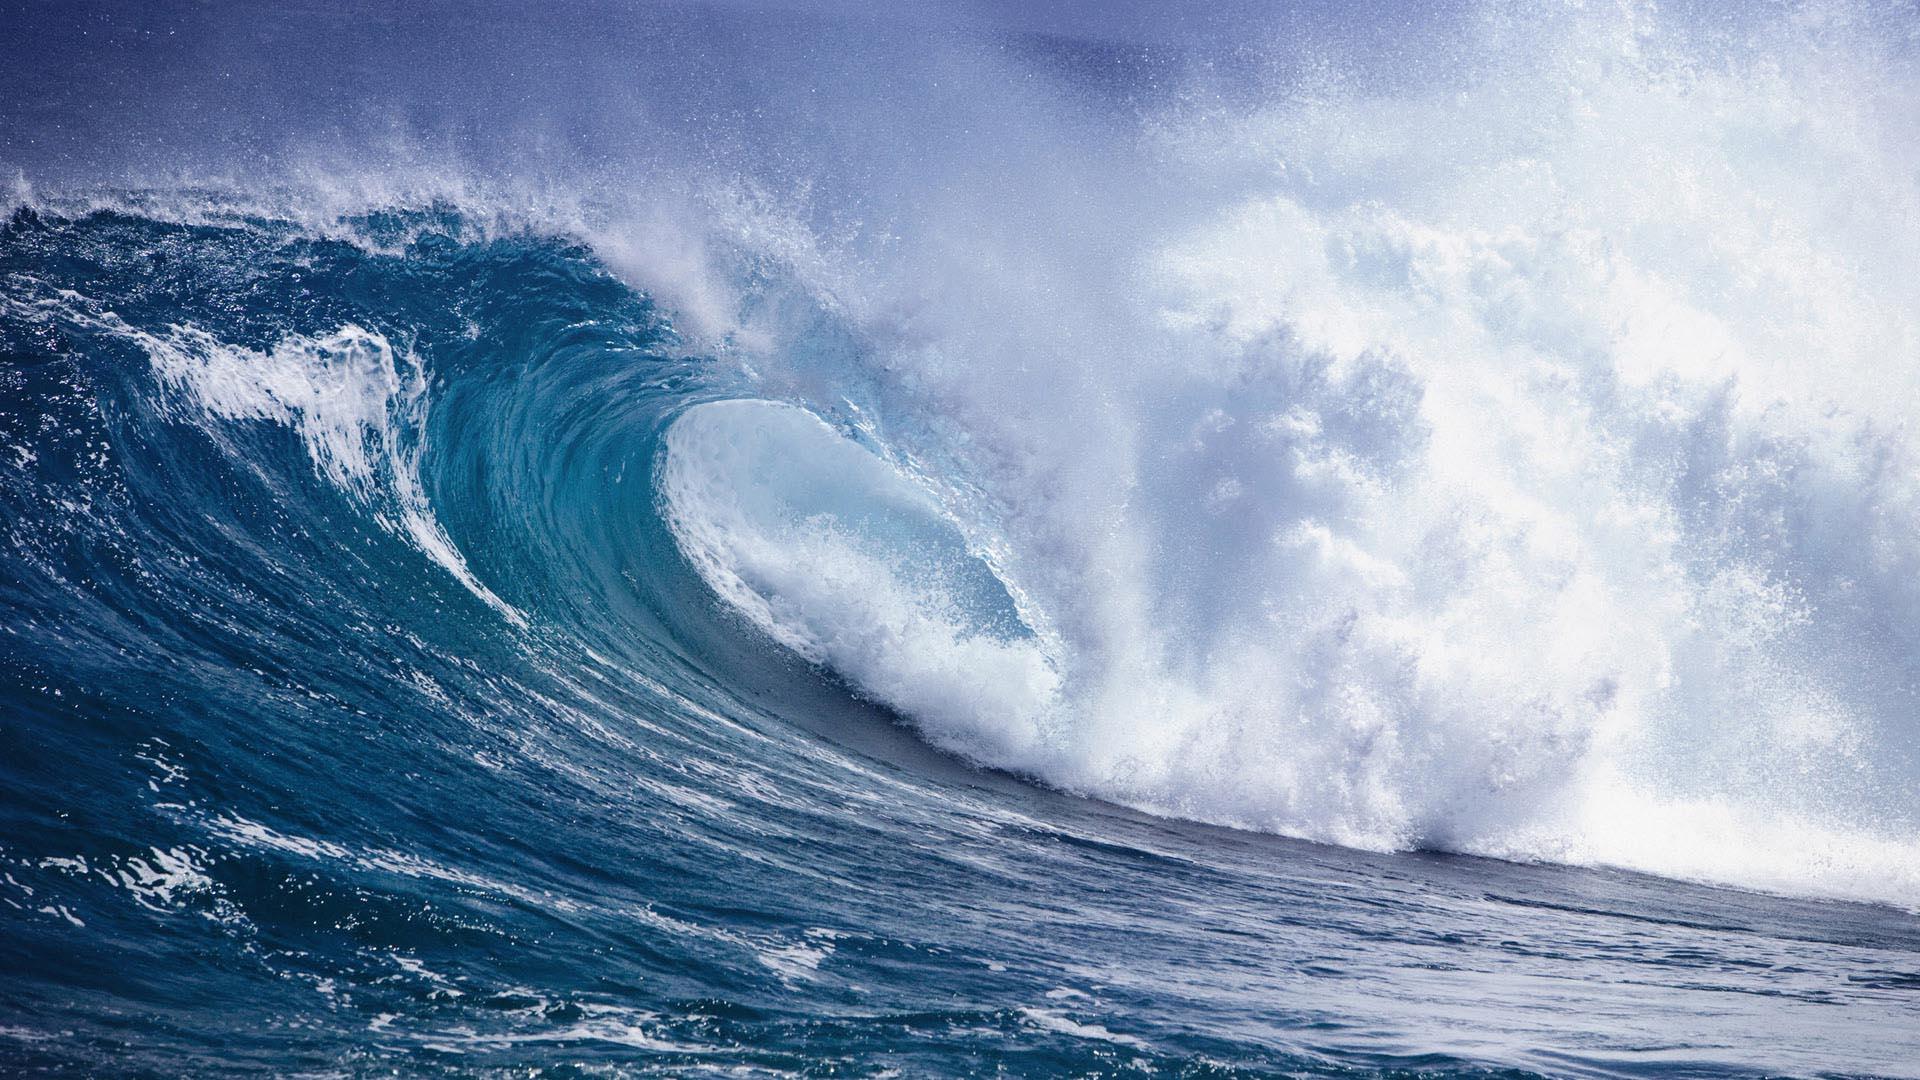 Waves Background Tumblr 1920x1080